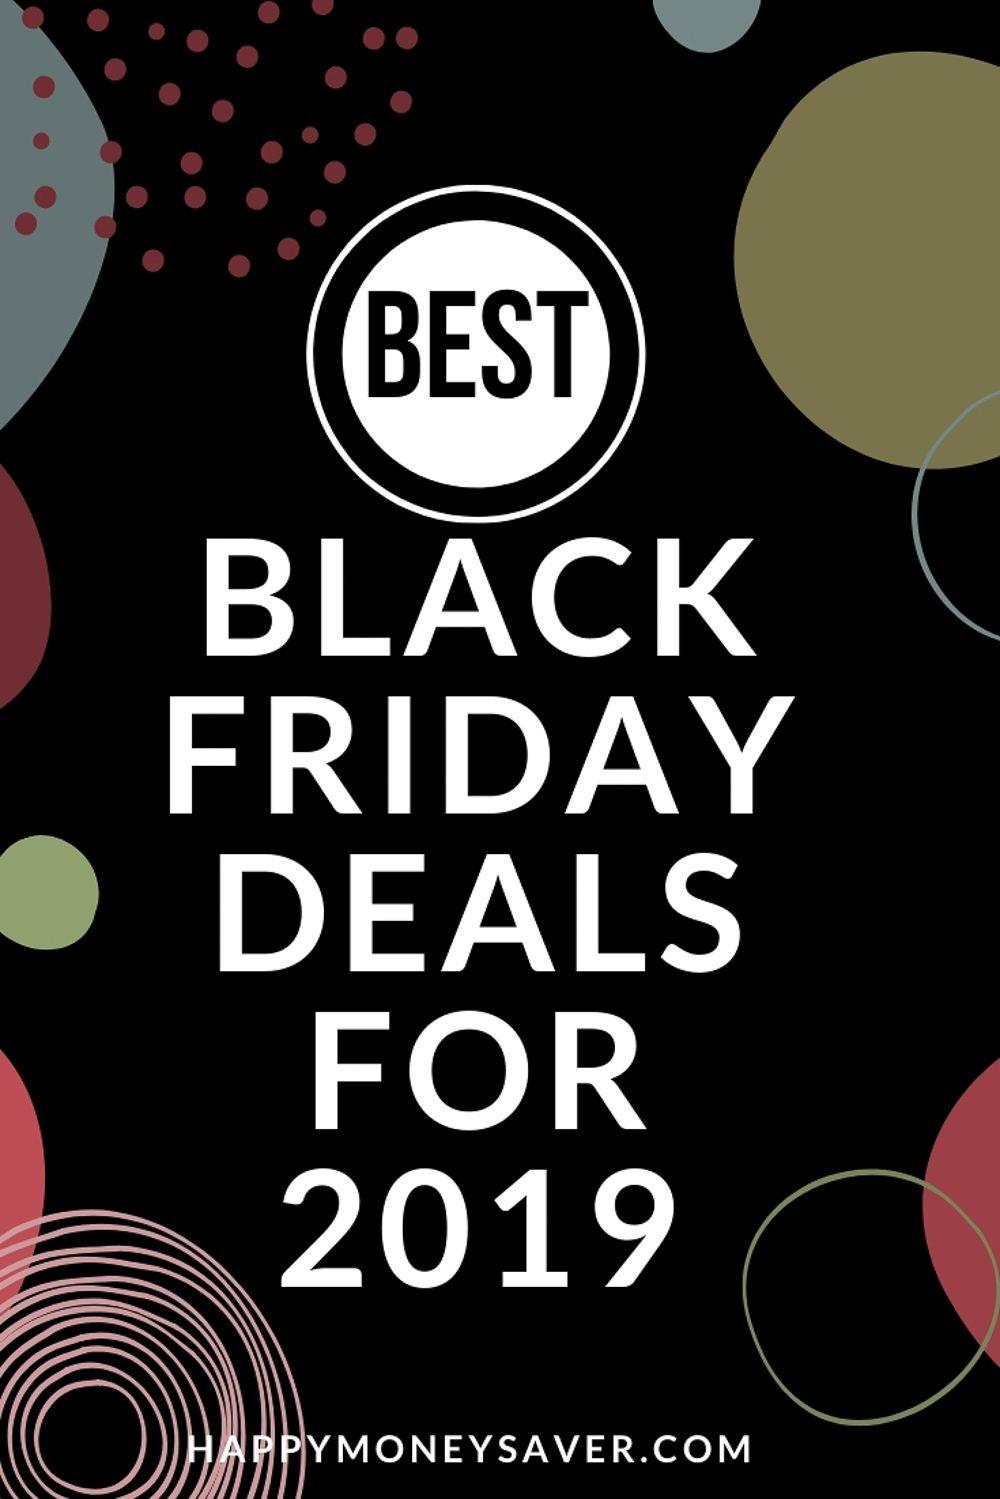 Top Black Friday Deals 2019 + Amazon price comparison